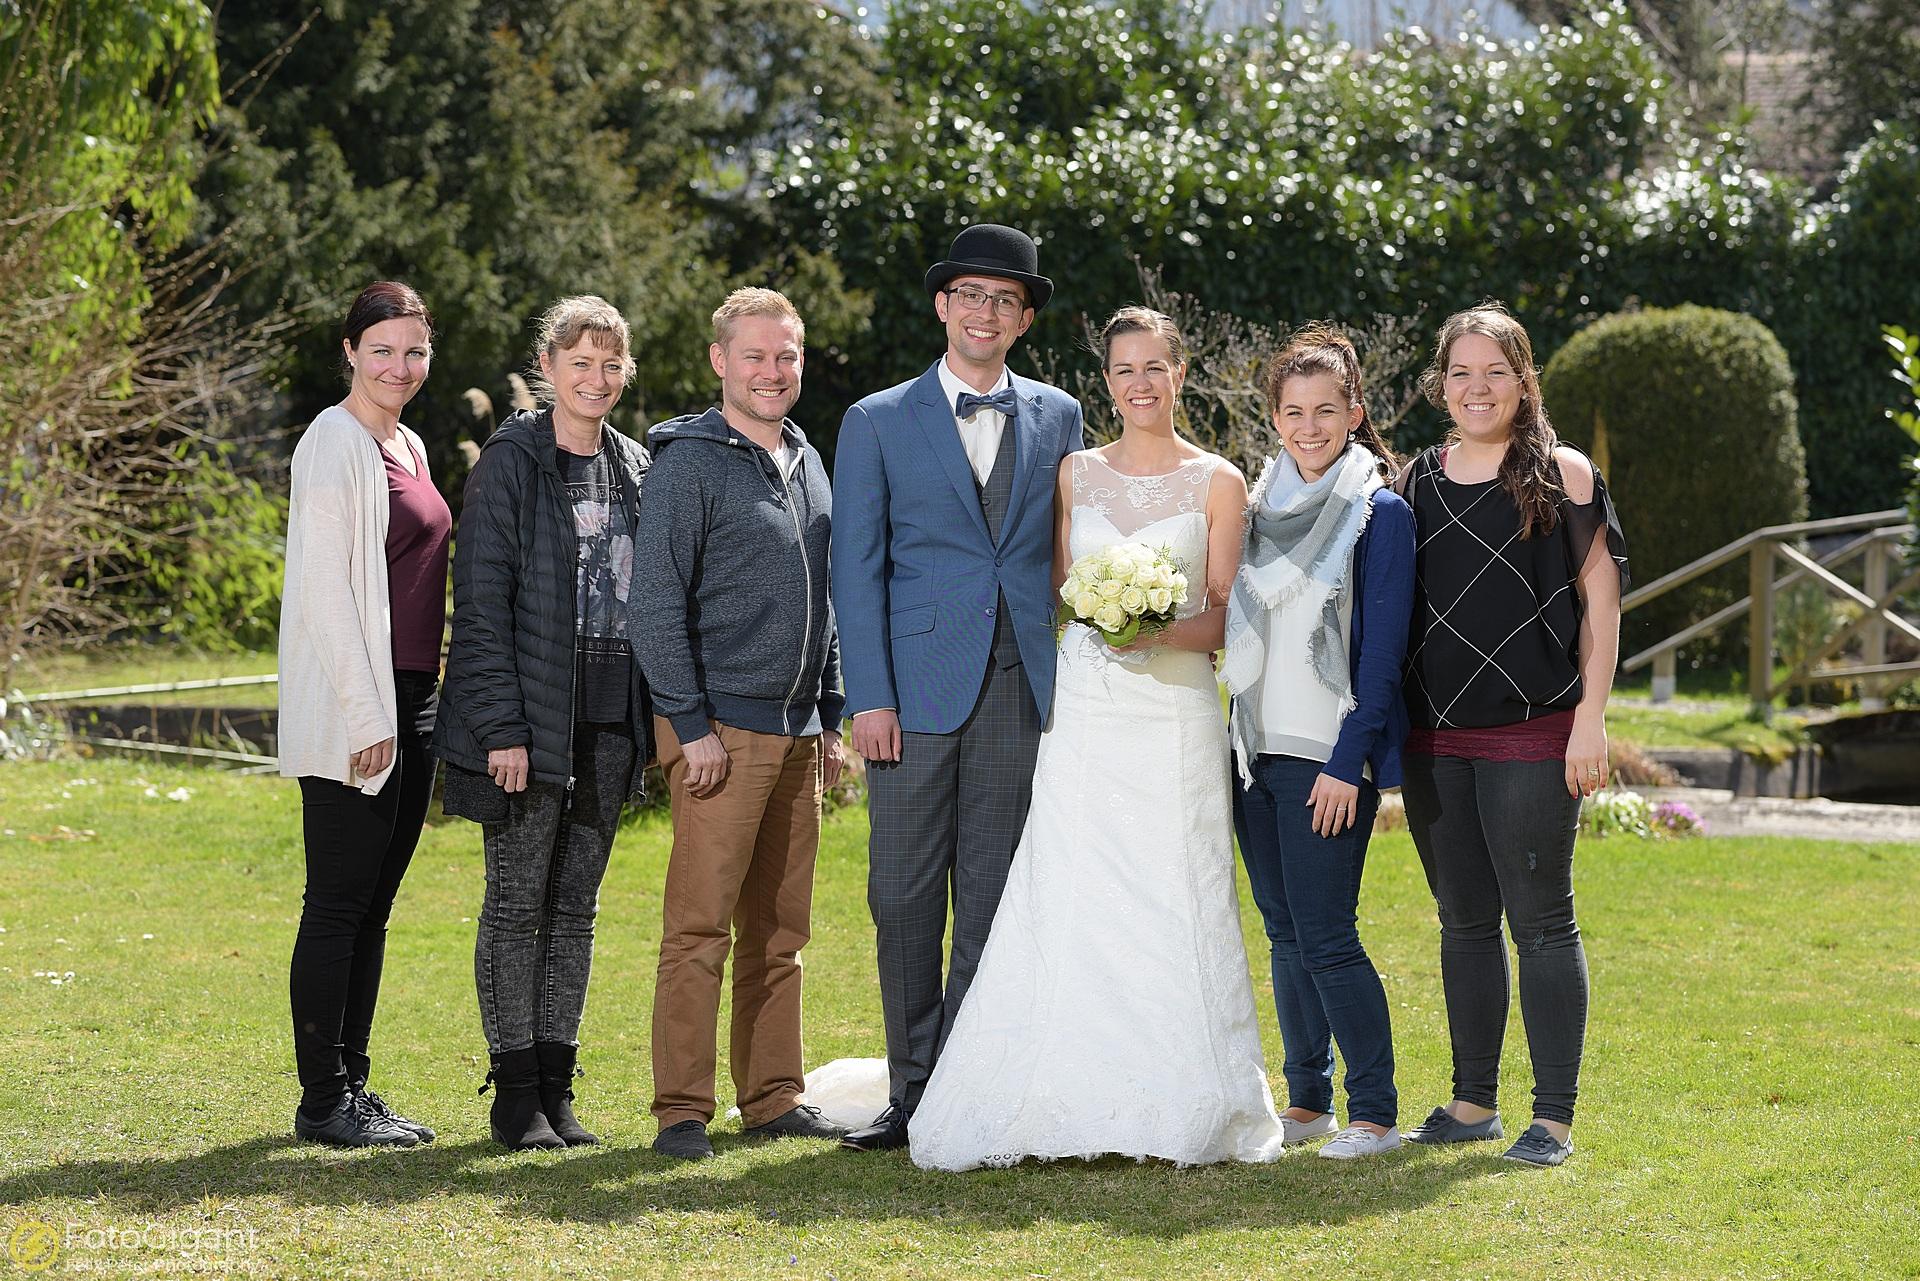 Hochzeitsfotografiekurs_Fotograf_Felix_Peter_31.jpg